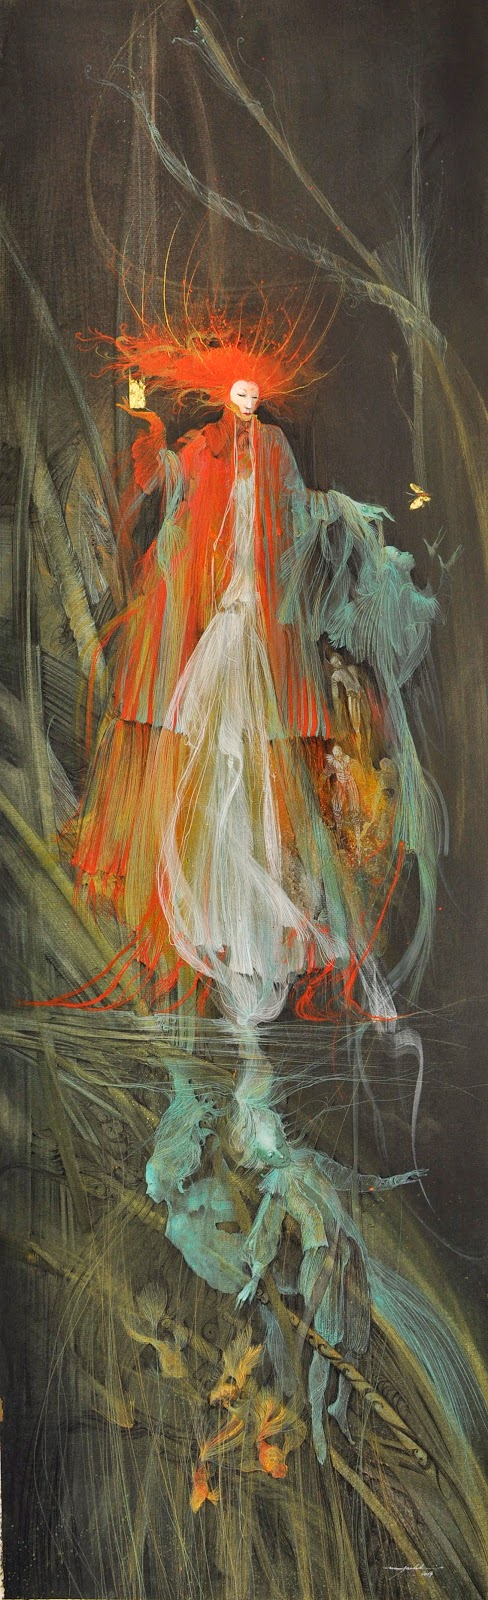 Anne Bachelier....so whimsical